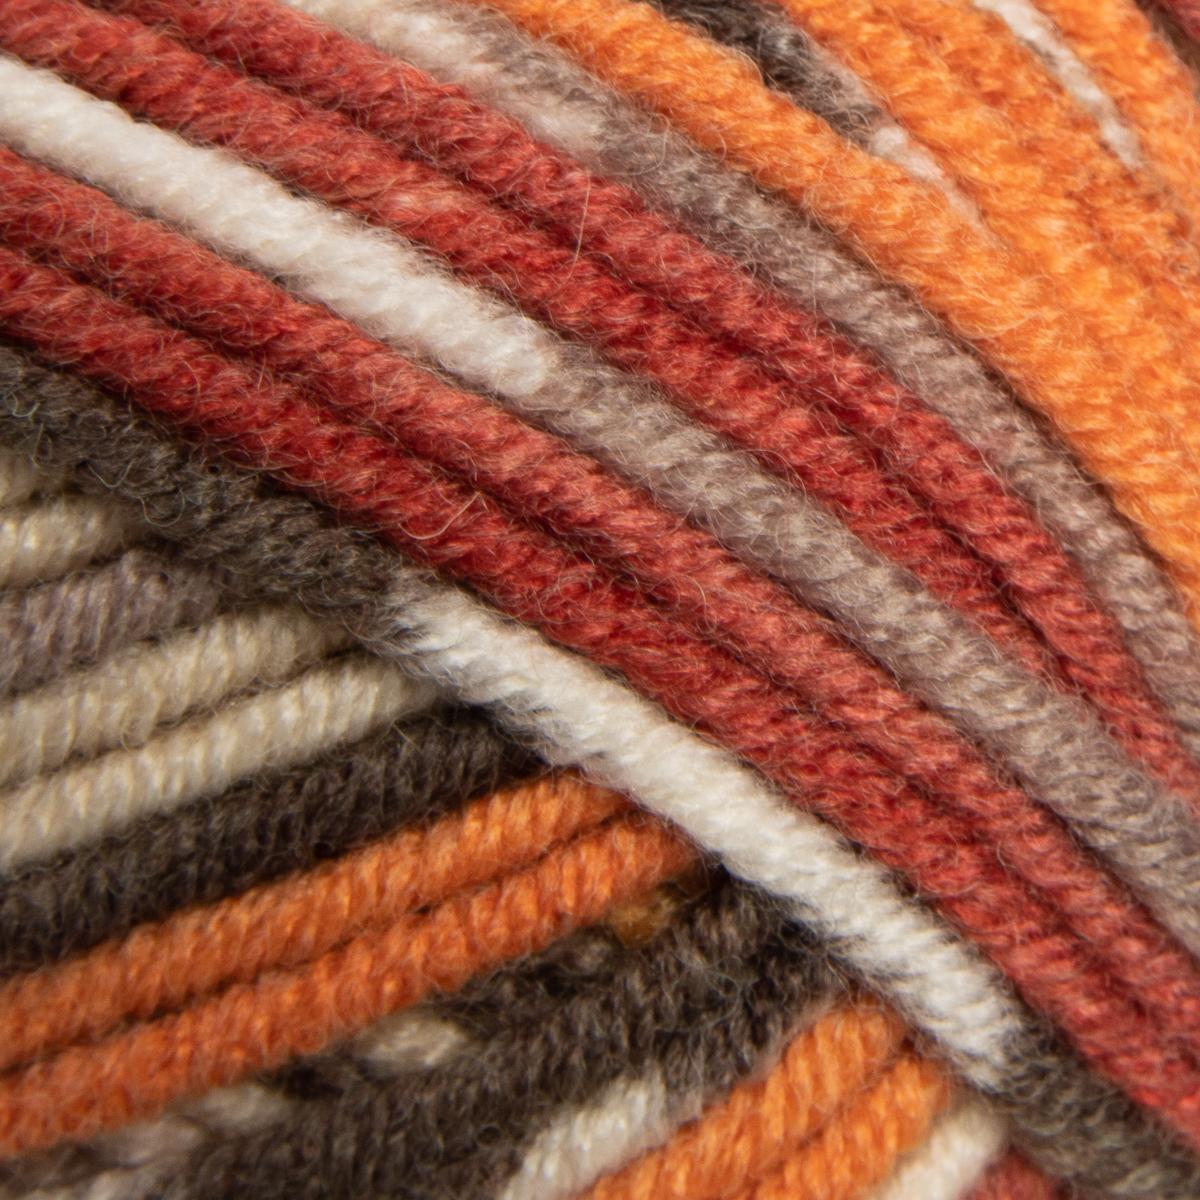 3pk-Lion-Brand-Woolspun-Acrylic-amp-Wool-Yarn-Bulky-5-Knit-Crocheting-Skeins-Soft thumbnail 39